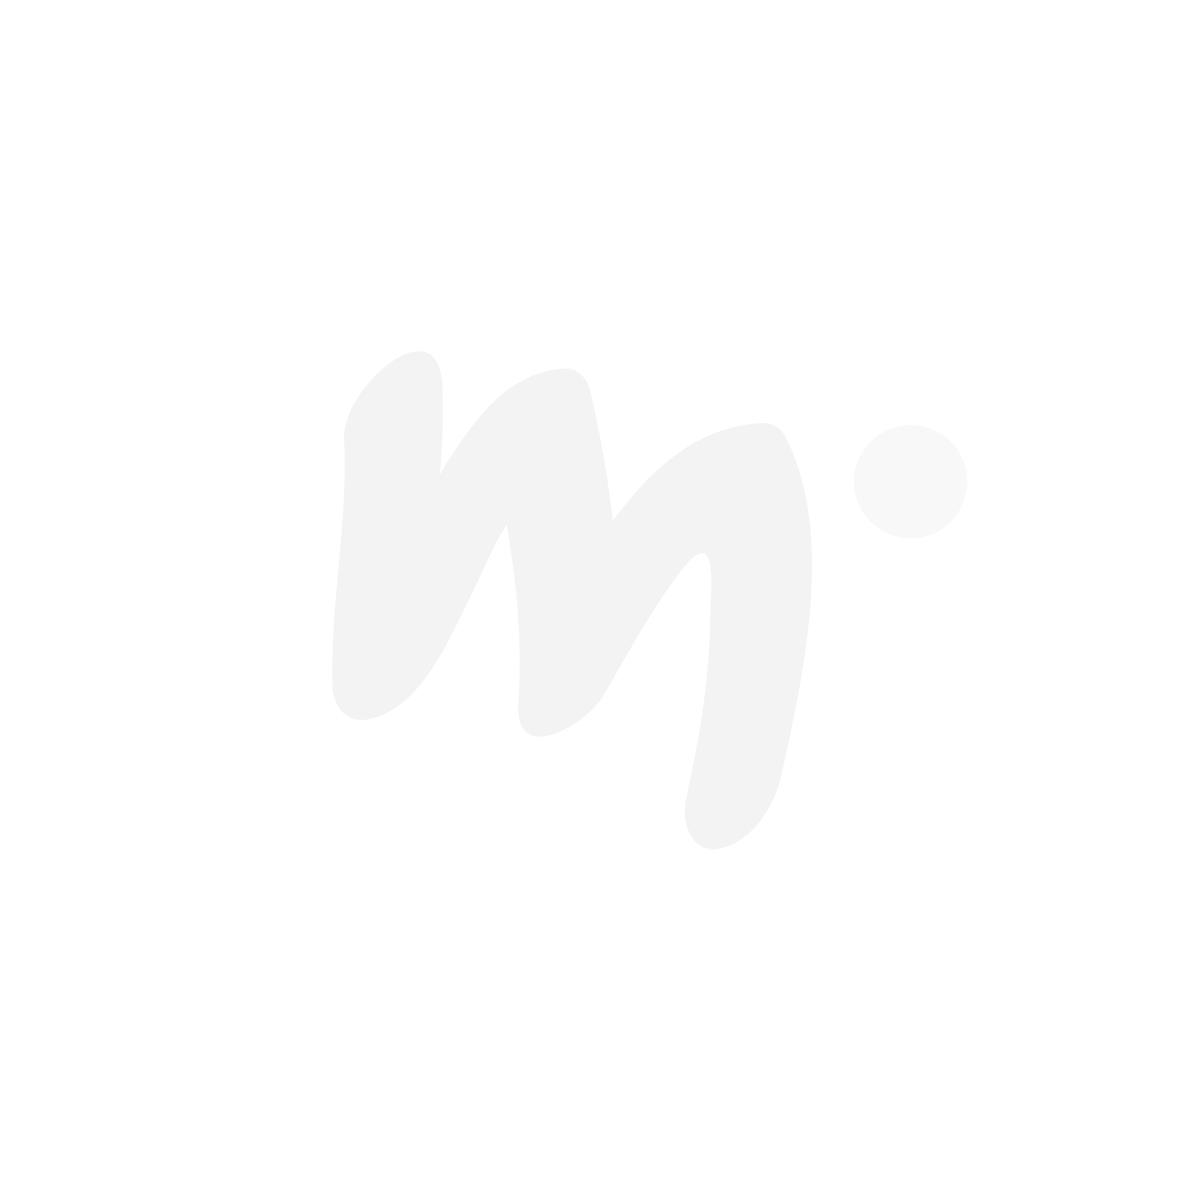 Muumi Akryylilasit 4 kpl